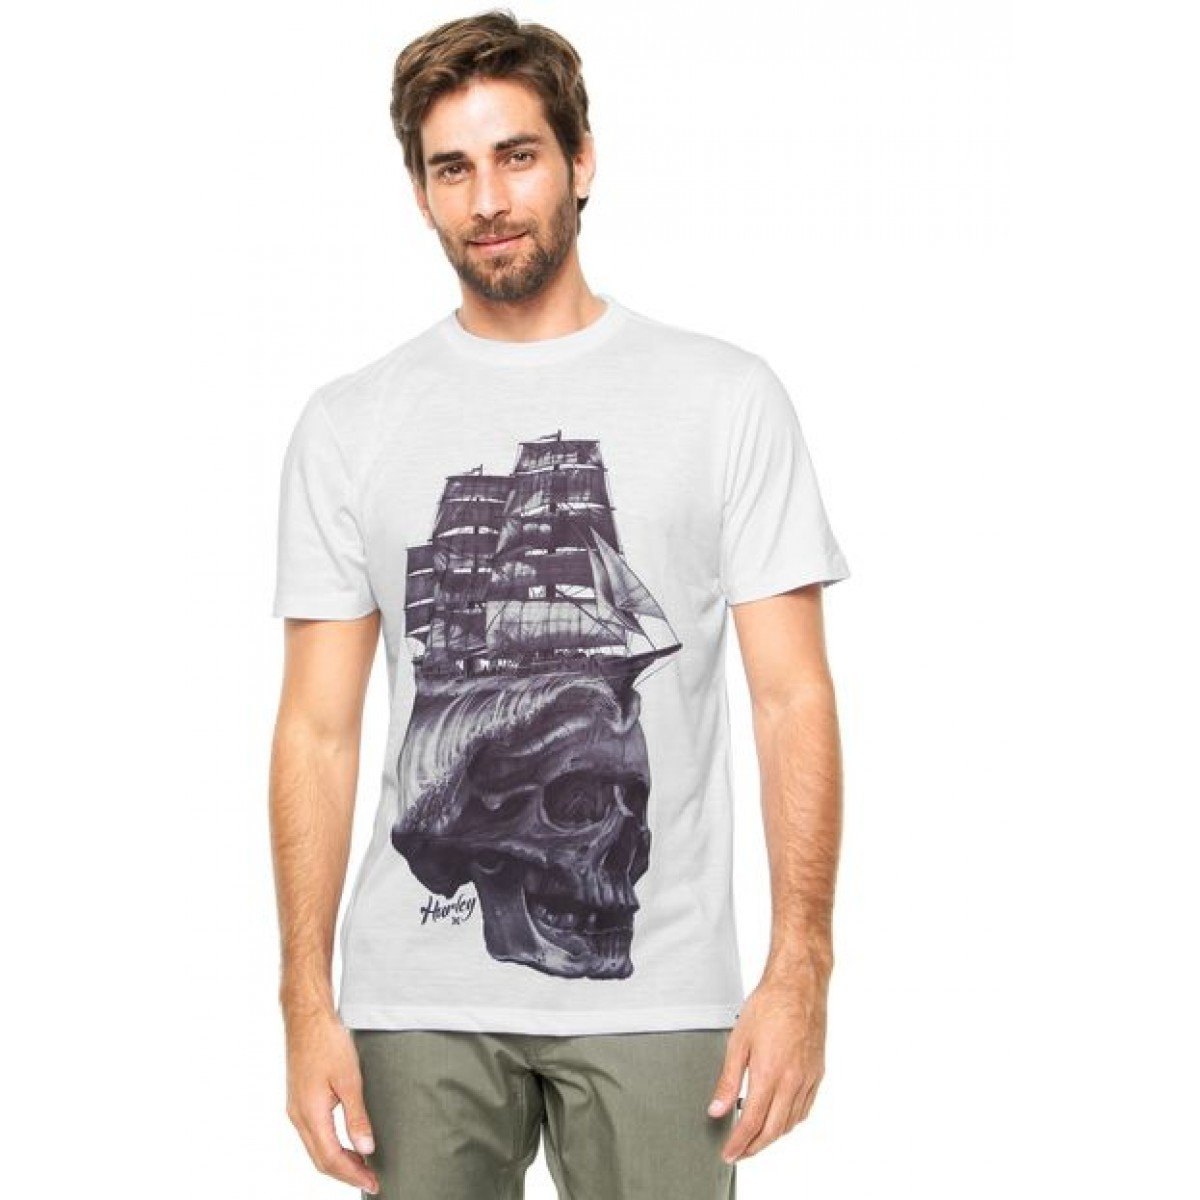 Camiseta Hurley Shiphead Masculina - Branca